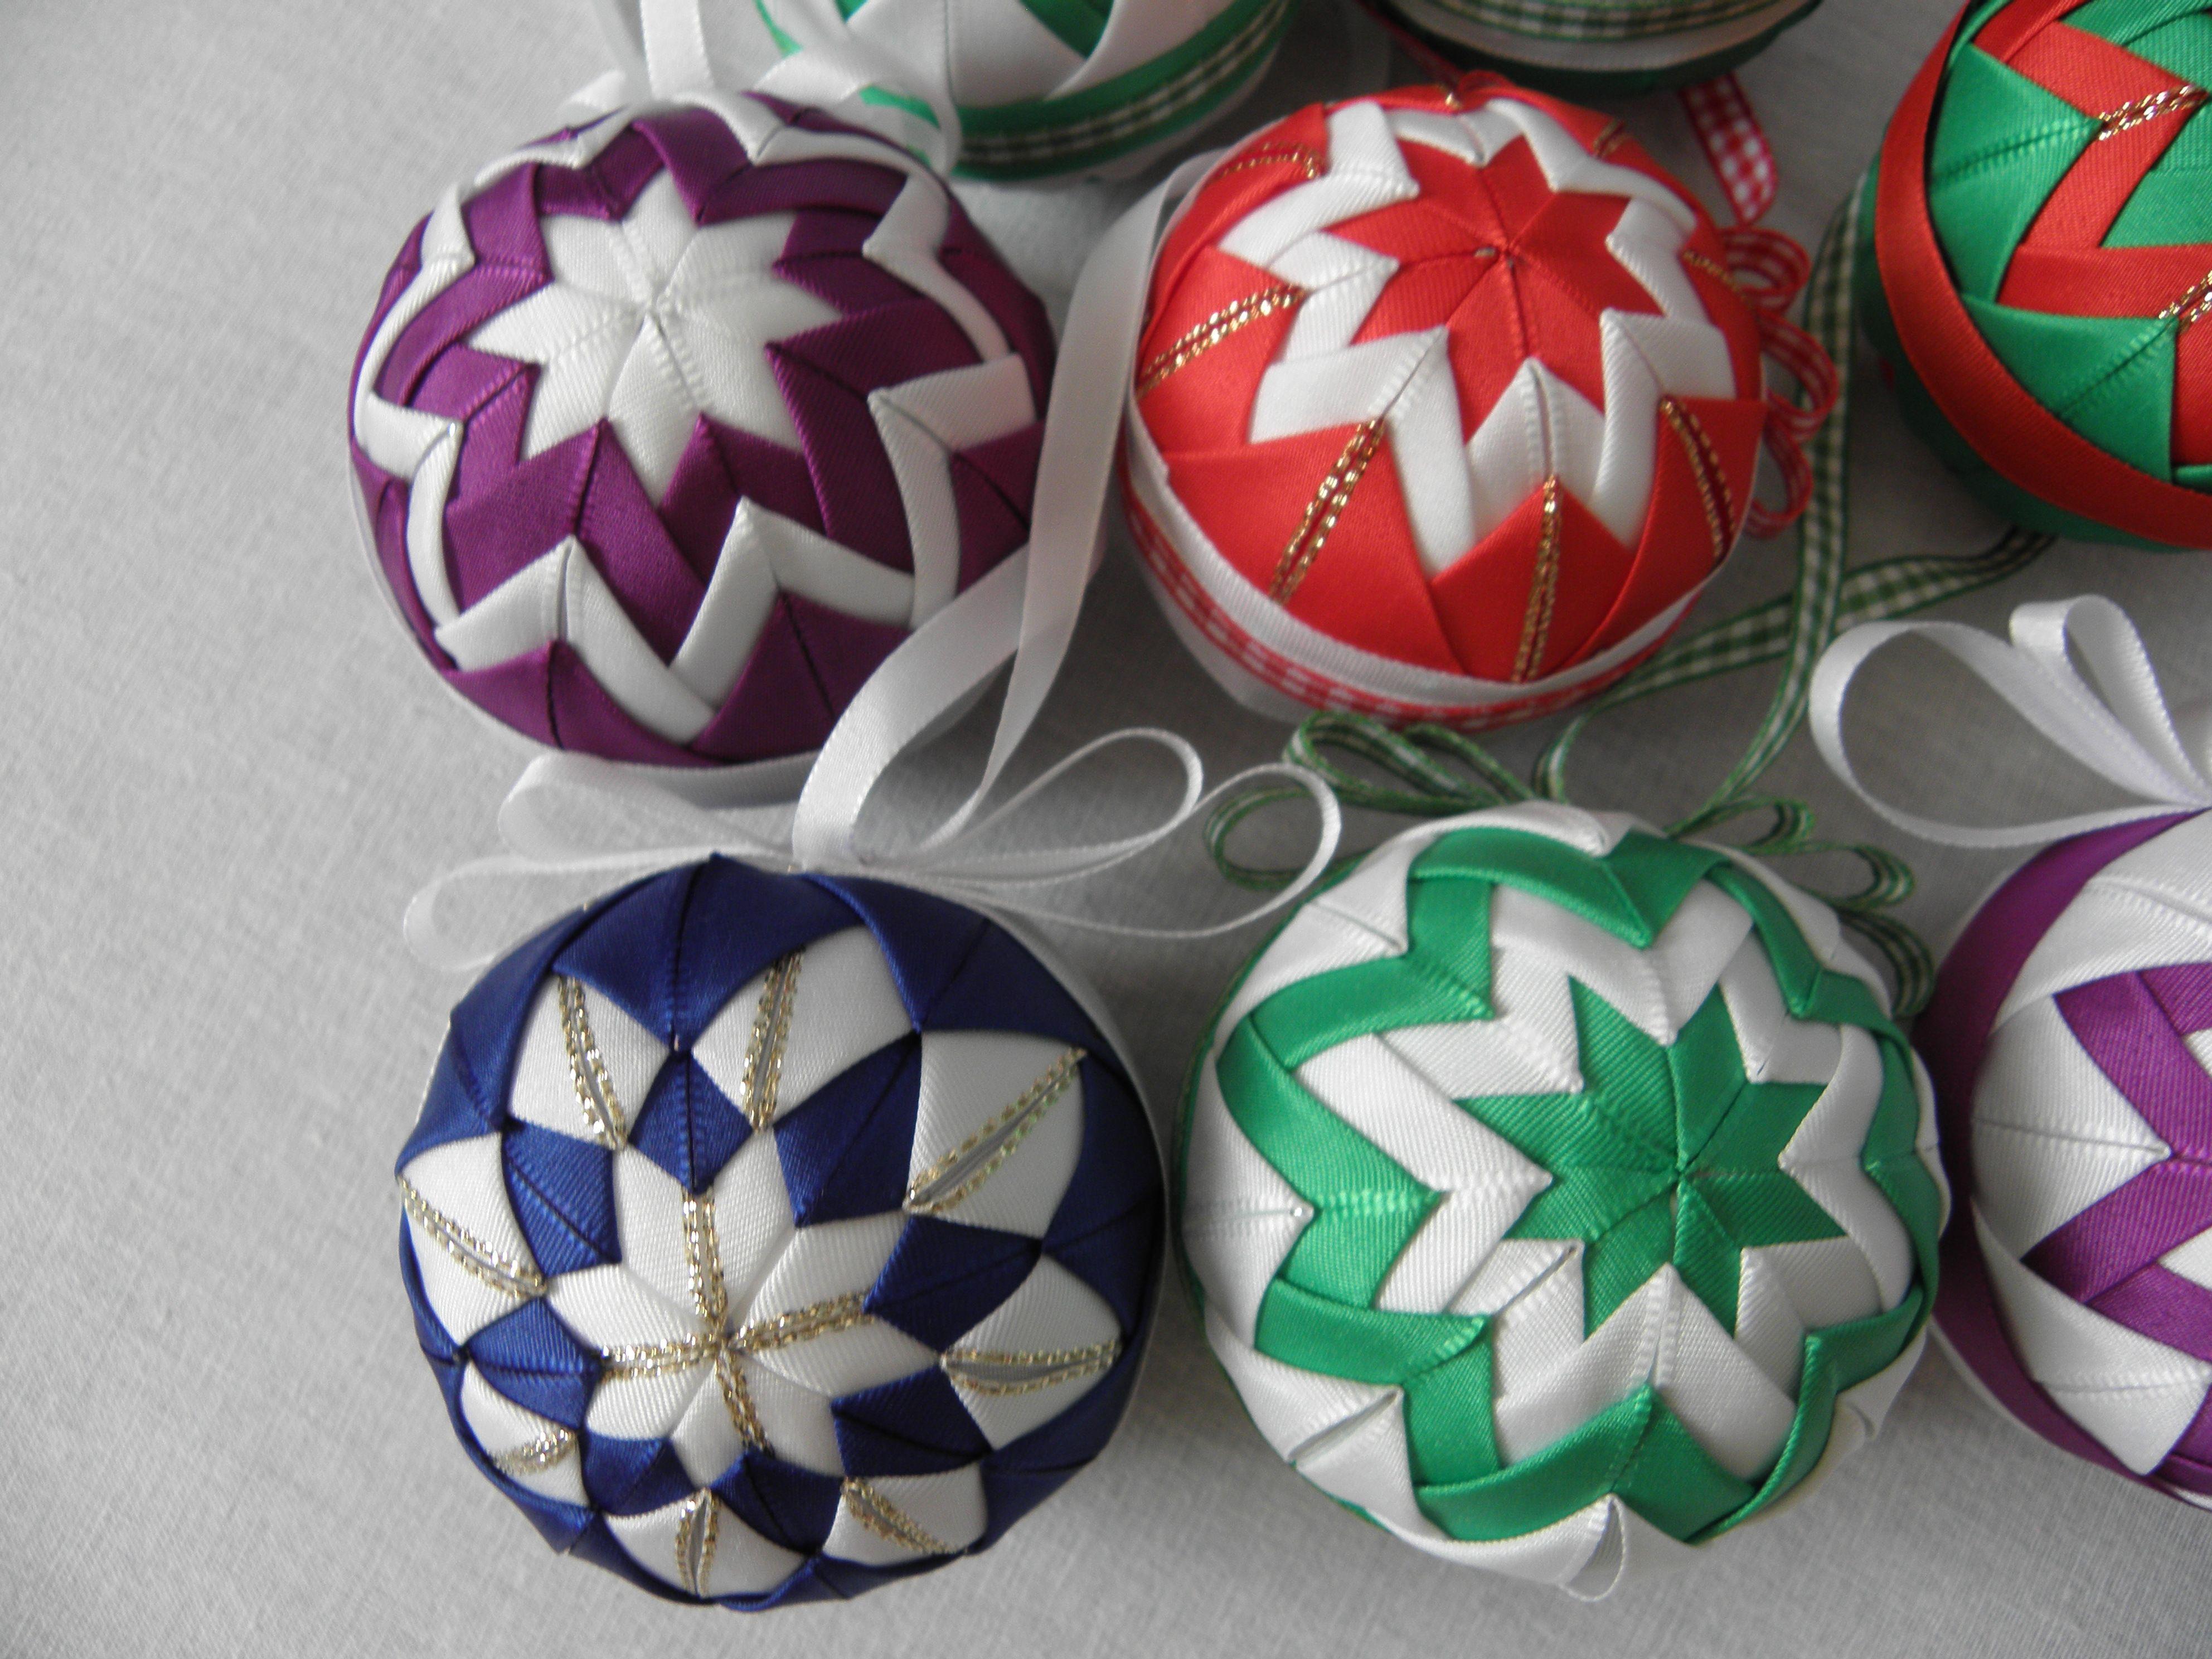 Folded fabric christmas ornaments patterns - Fale N Patchwork V No N Folded Fabric Ornamentsquilted Ornamentskanzashi Flowerscross Stitch Patternschristmas